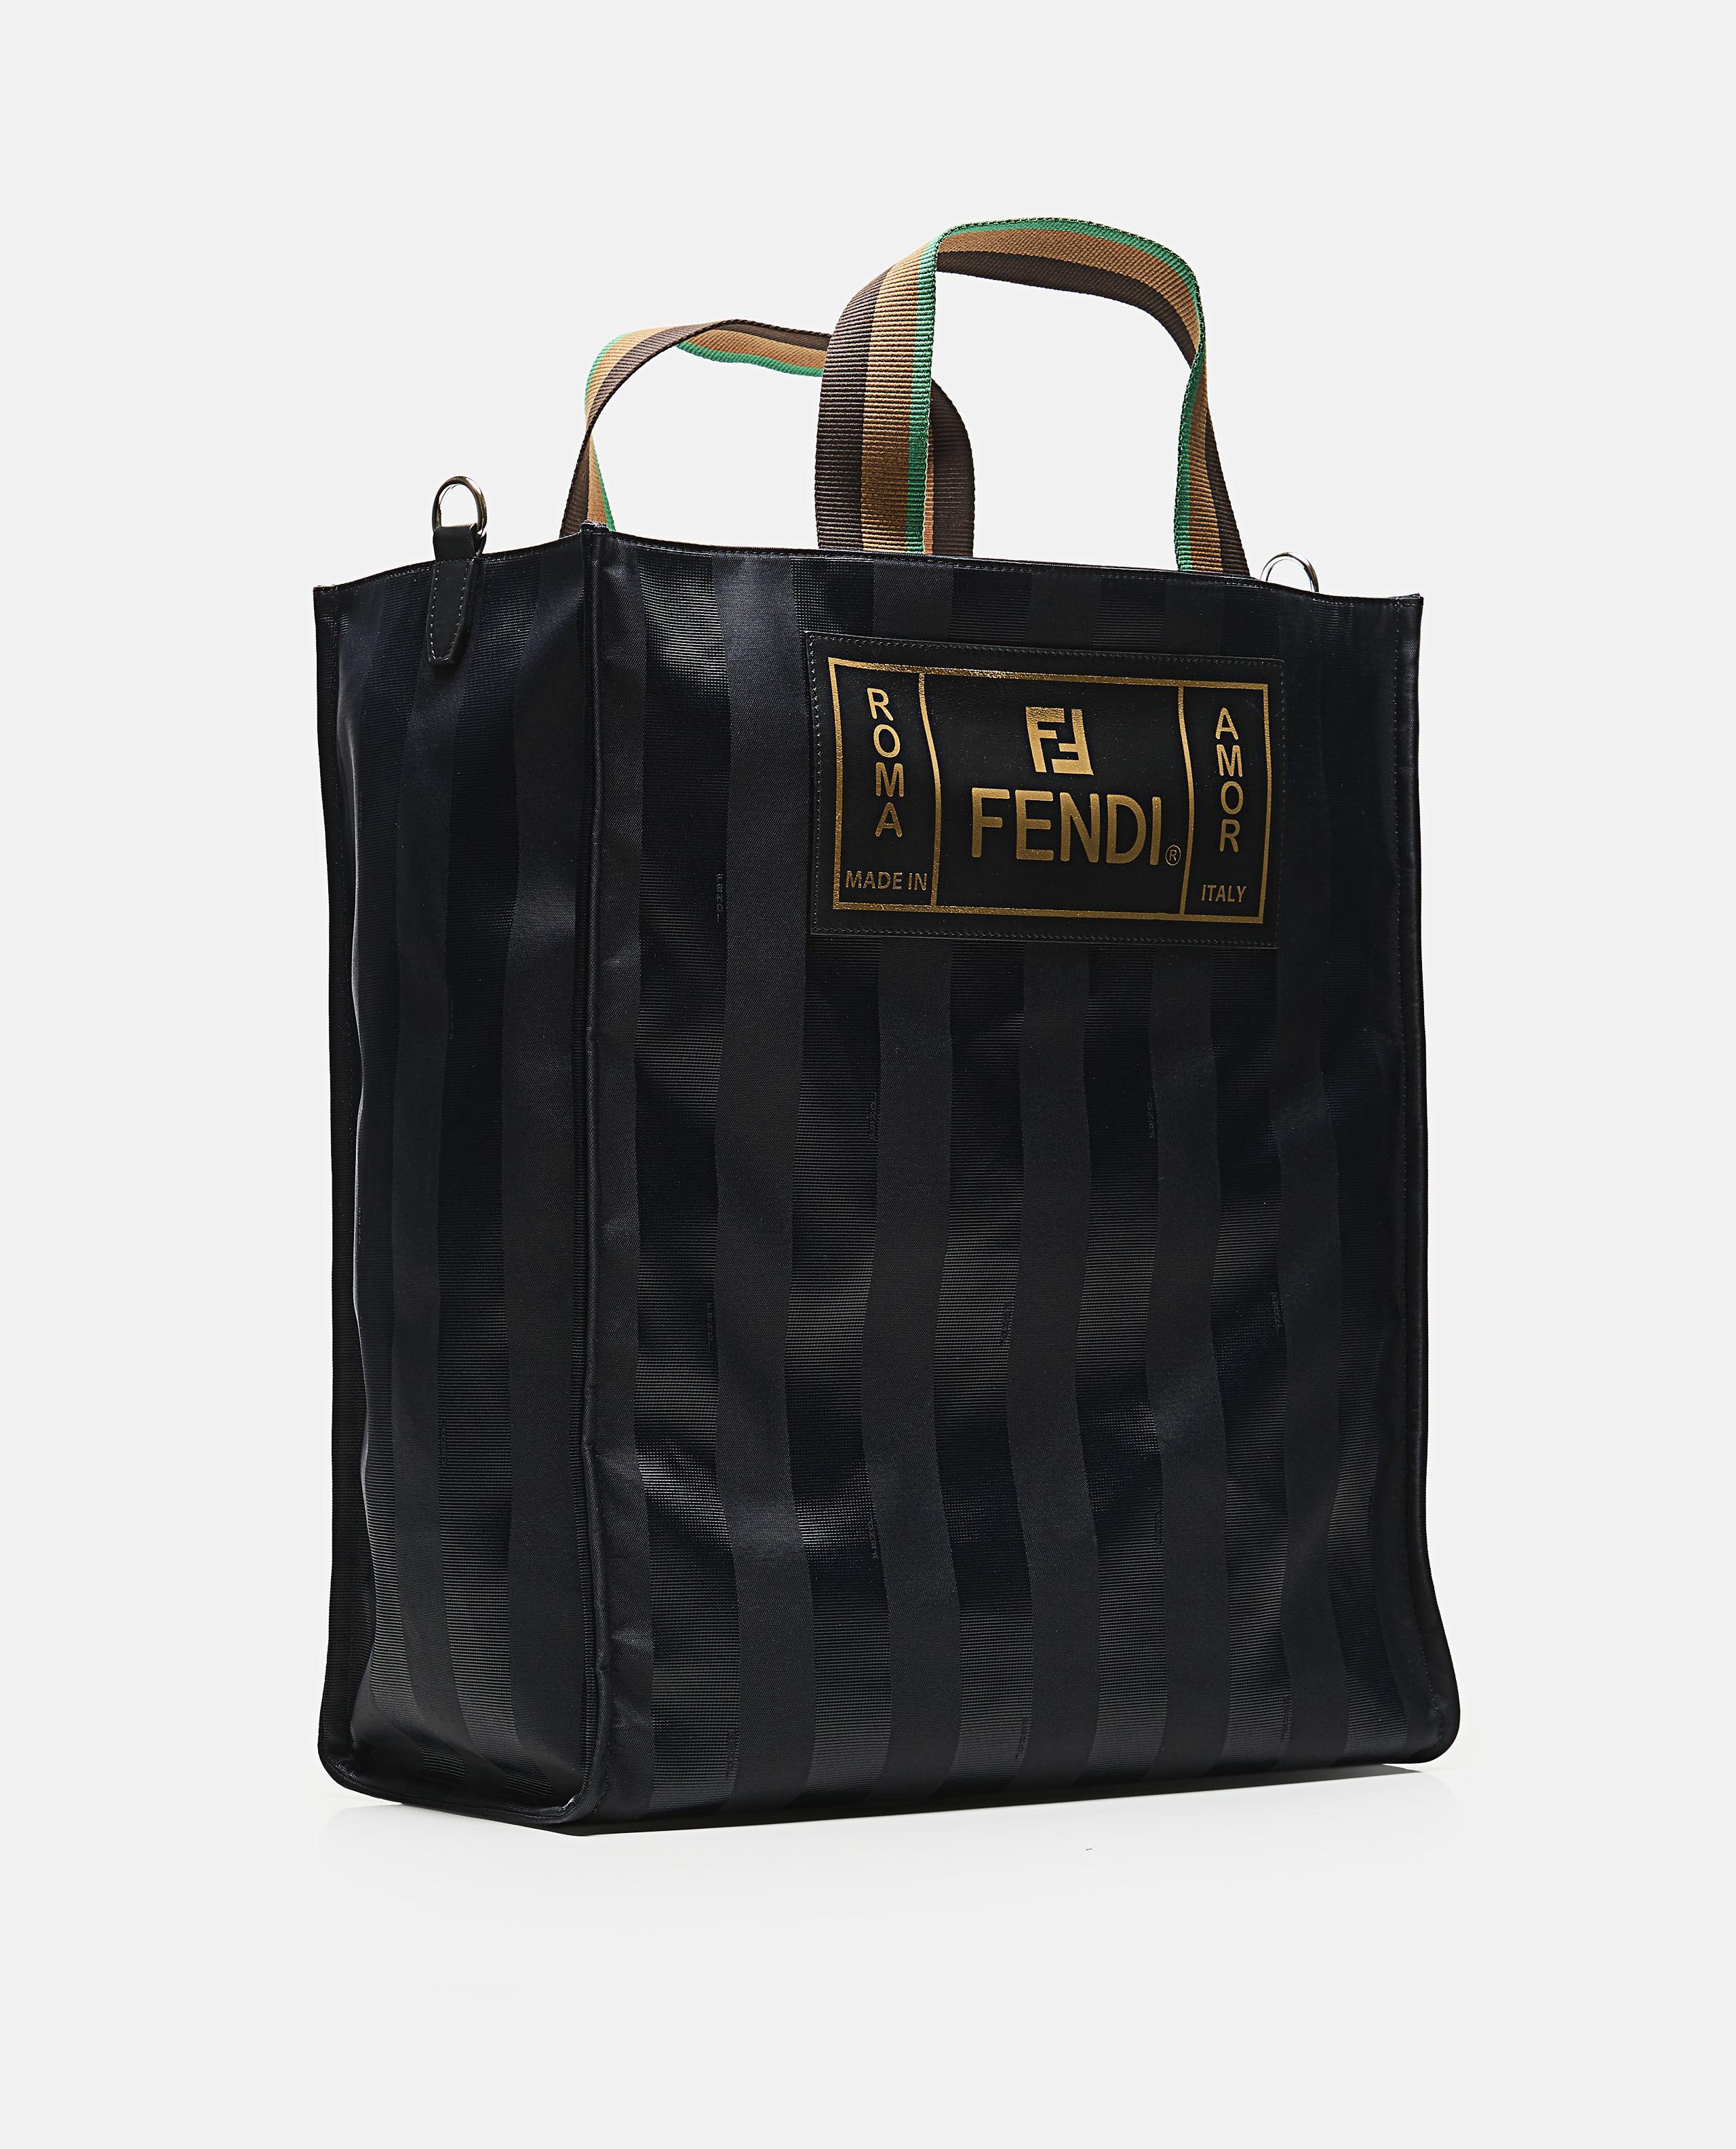 088d0d4198fd Fendi Striped Tote Bag in Black for Men - Save 31% - Lyst